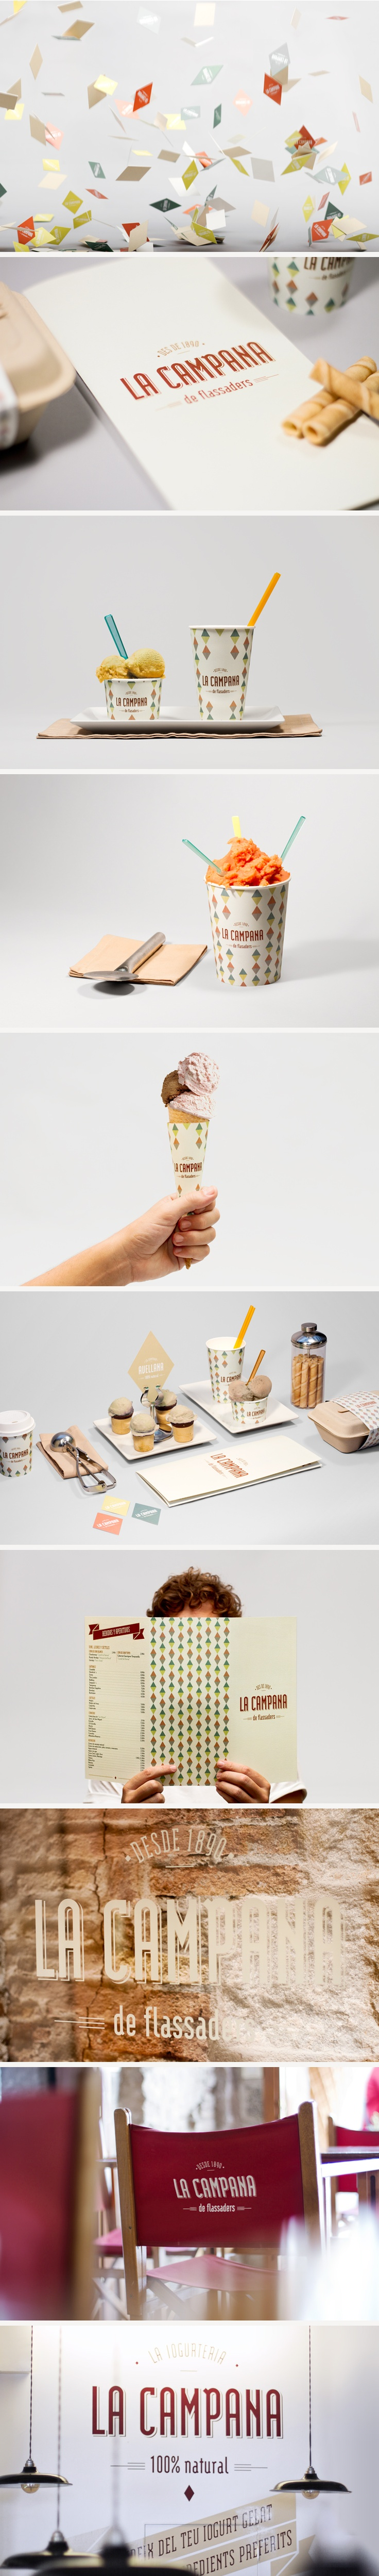 La Campana | Comité Studio